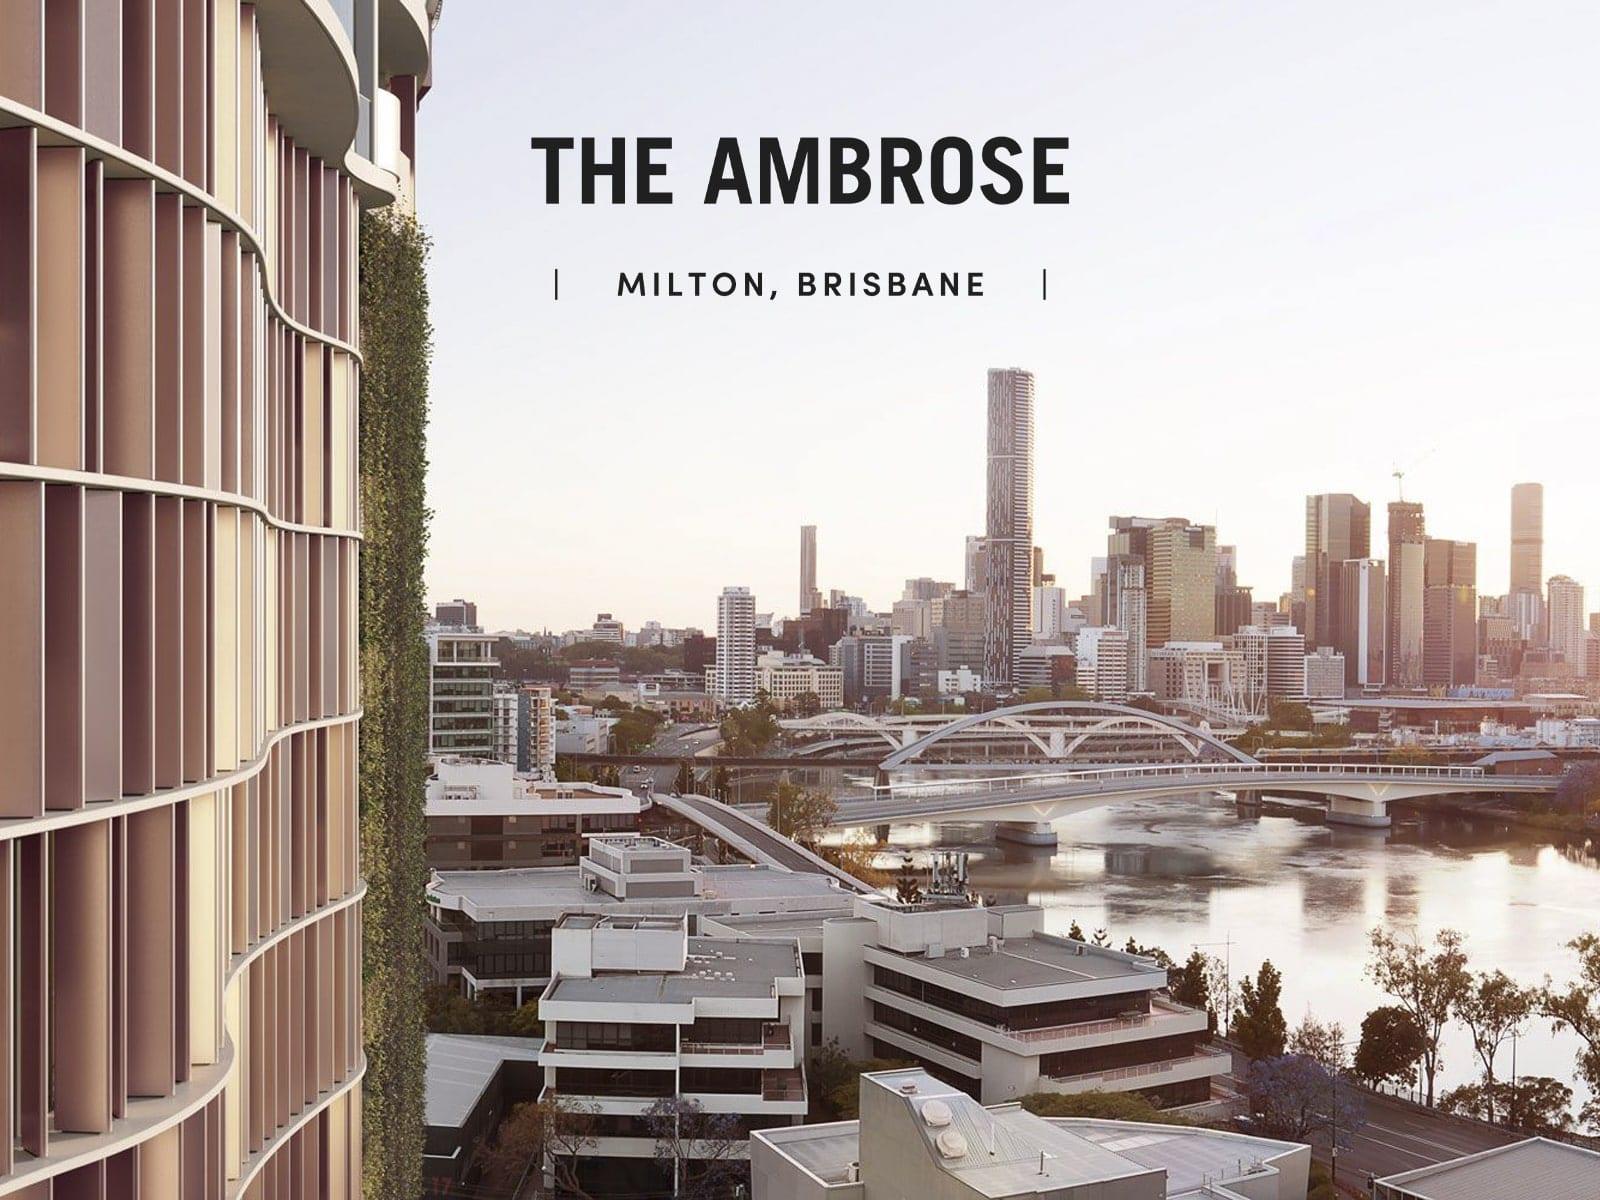 The Ambrose